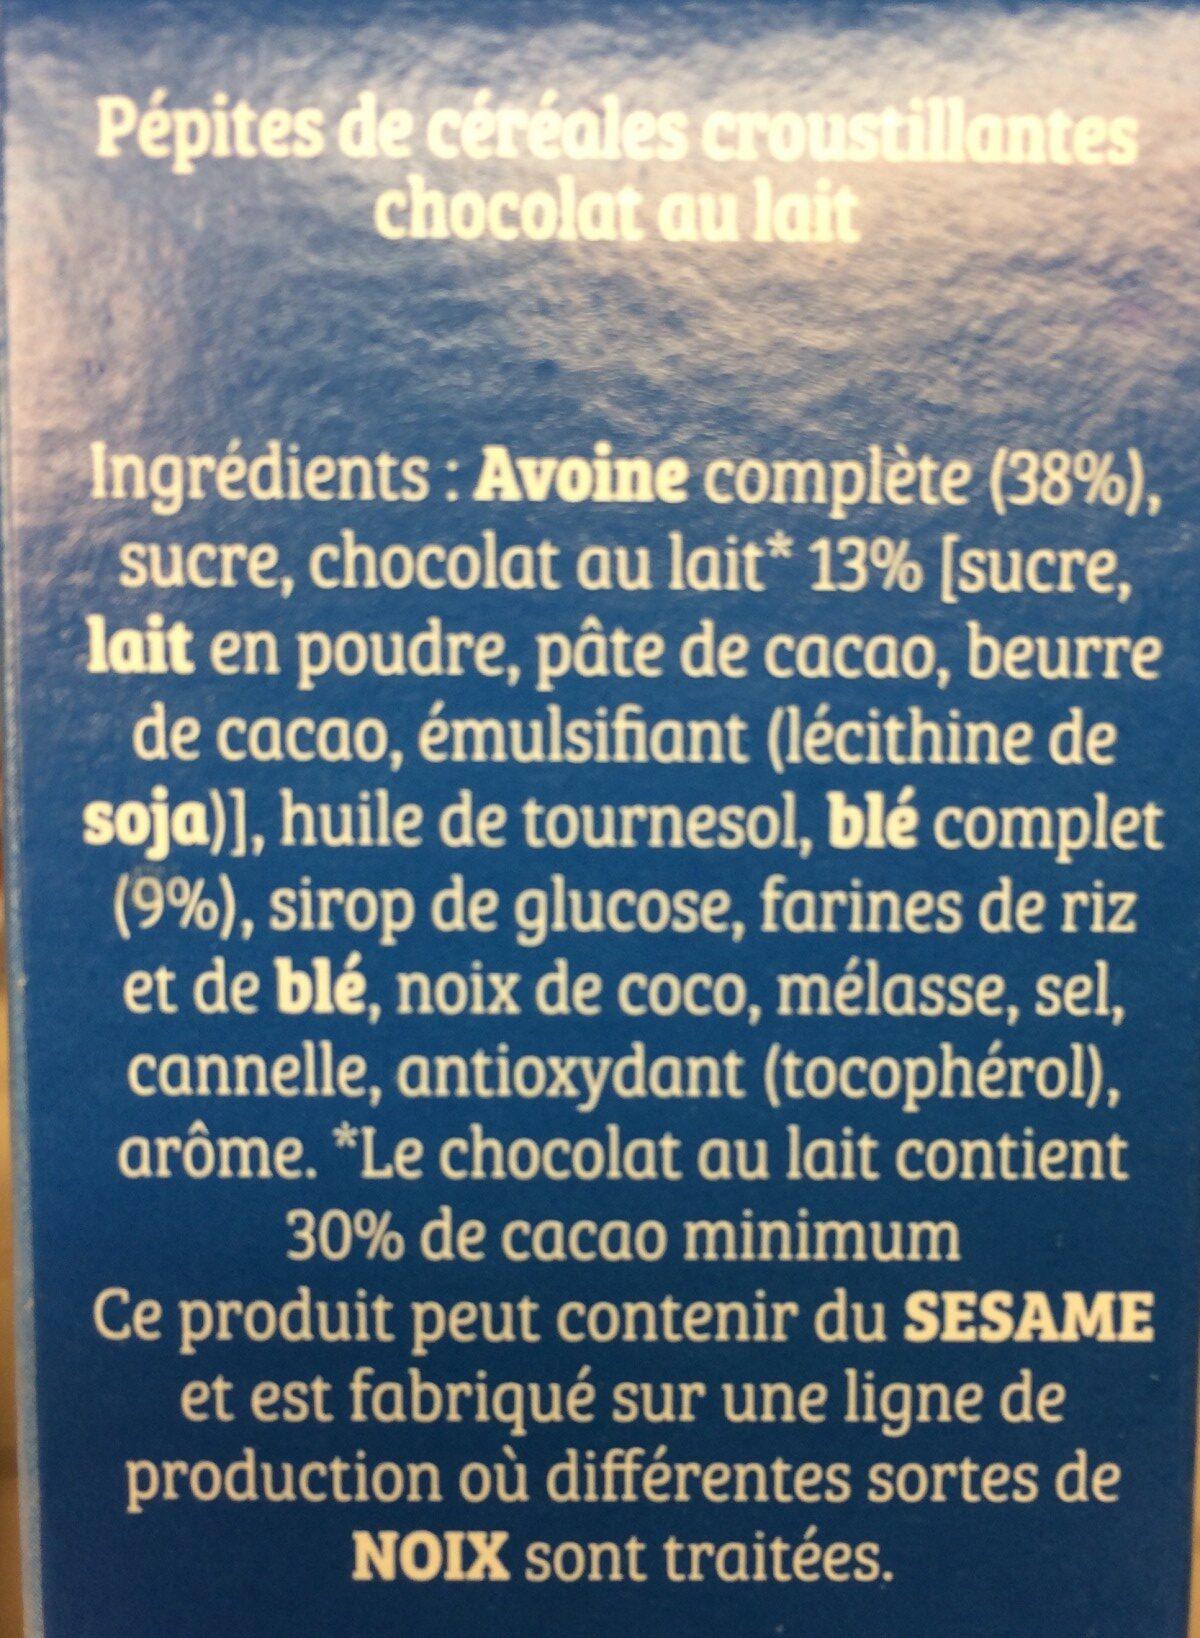 Cruesli - chocolat au lait - Ingrédients - fr